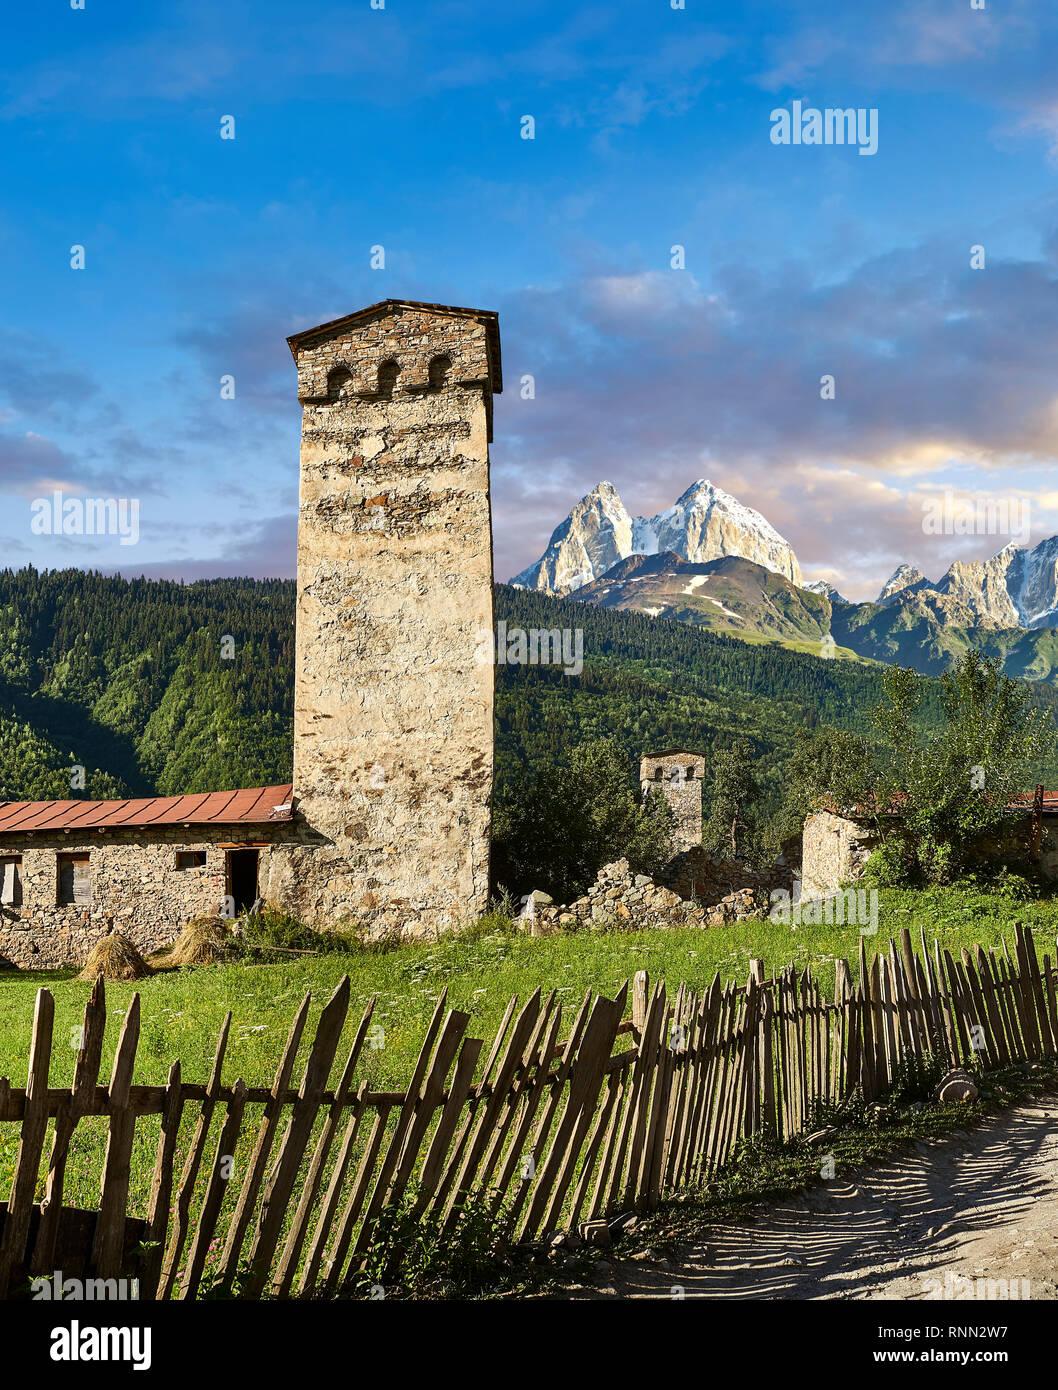 Stone medieval Svaneti tower houses of Lashtkhveri village in the Caucasus mountains, Upper Svaneti, Samegrelo-Zemo Svaneti, Mestia, Georgia.  A UNESC - Stock Image